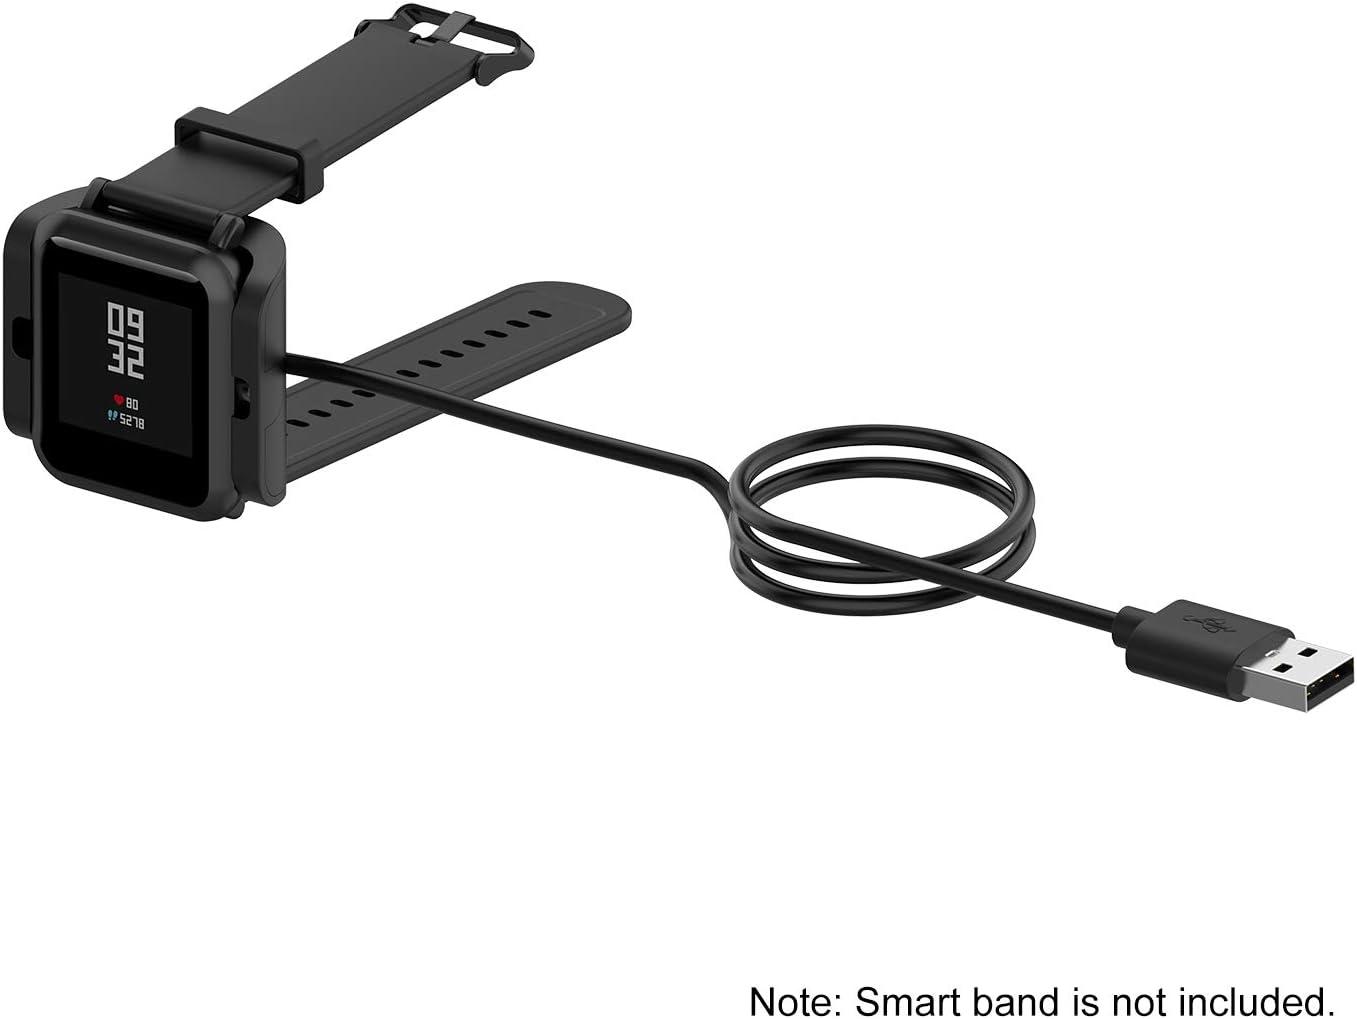 A1805 Ajcoflt Cable de Base de Carga USB Smart Band Compatible con el Cargador con Clip Amazfit bip S 1s 1 Metro A1916